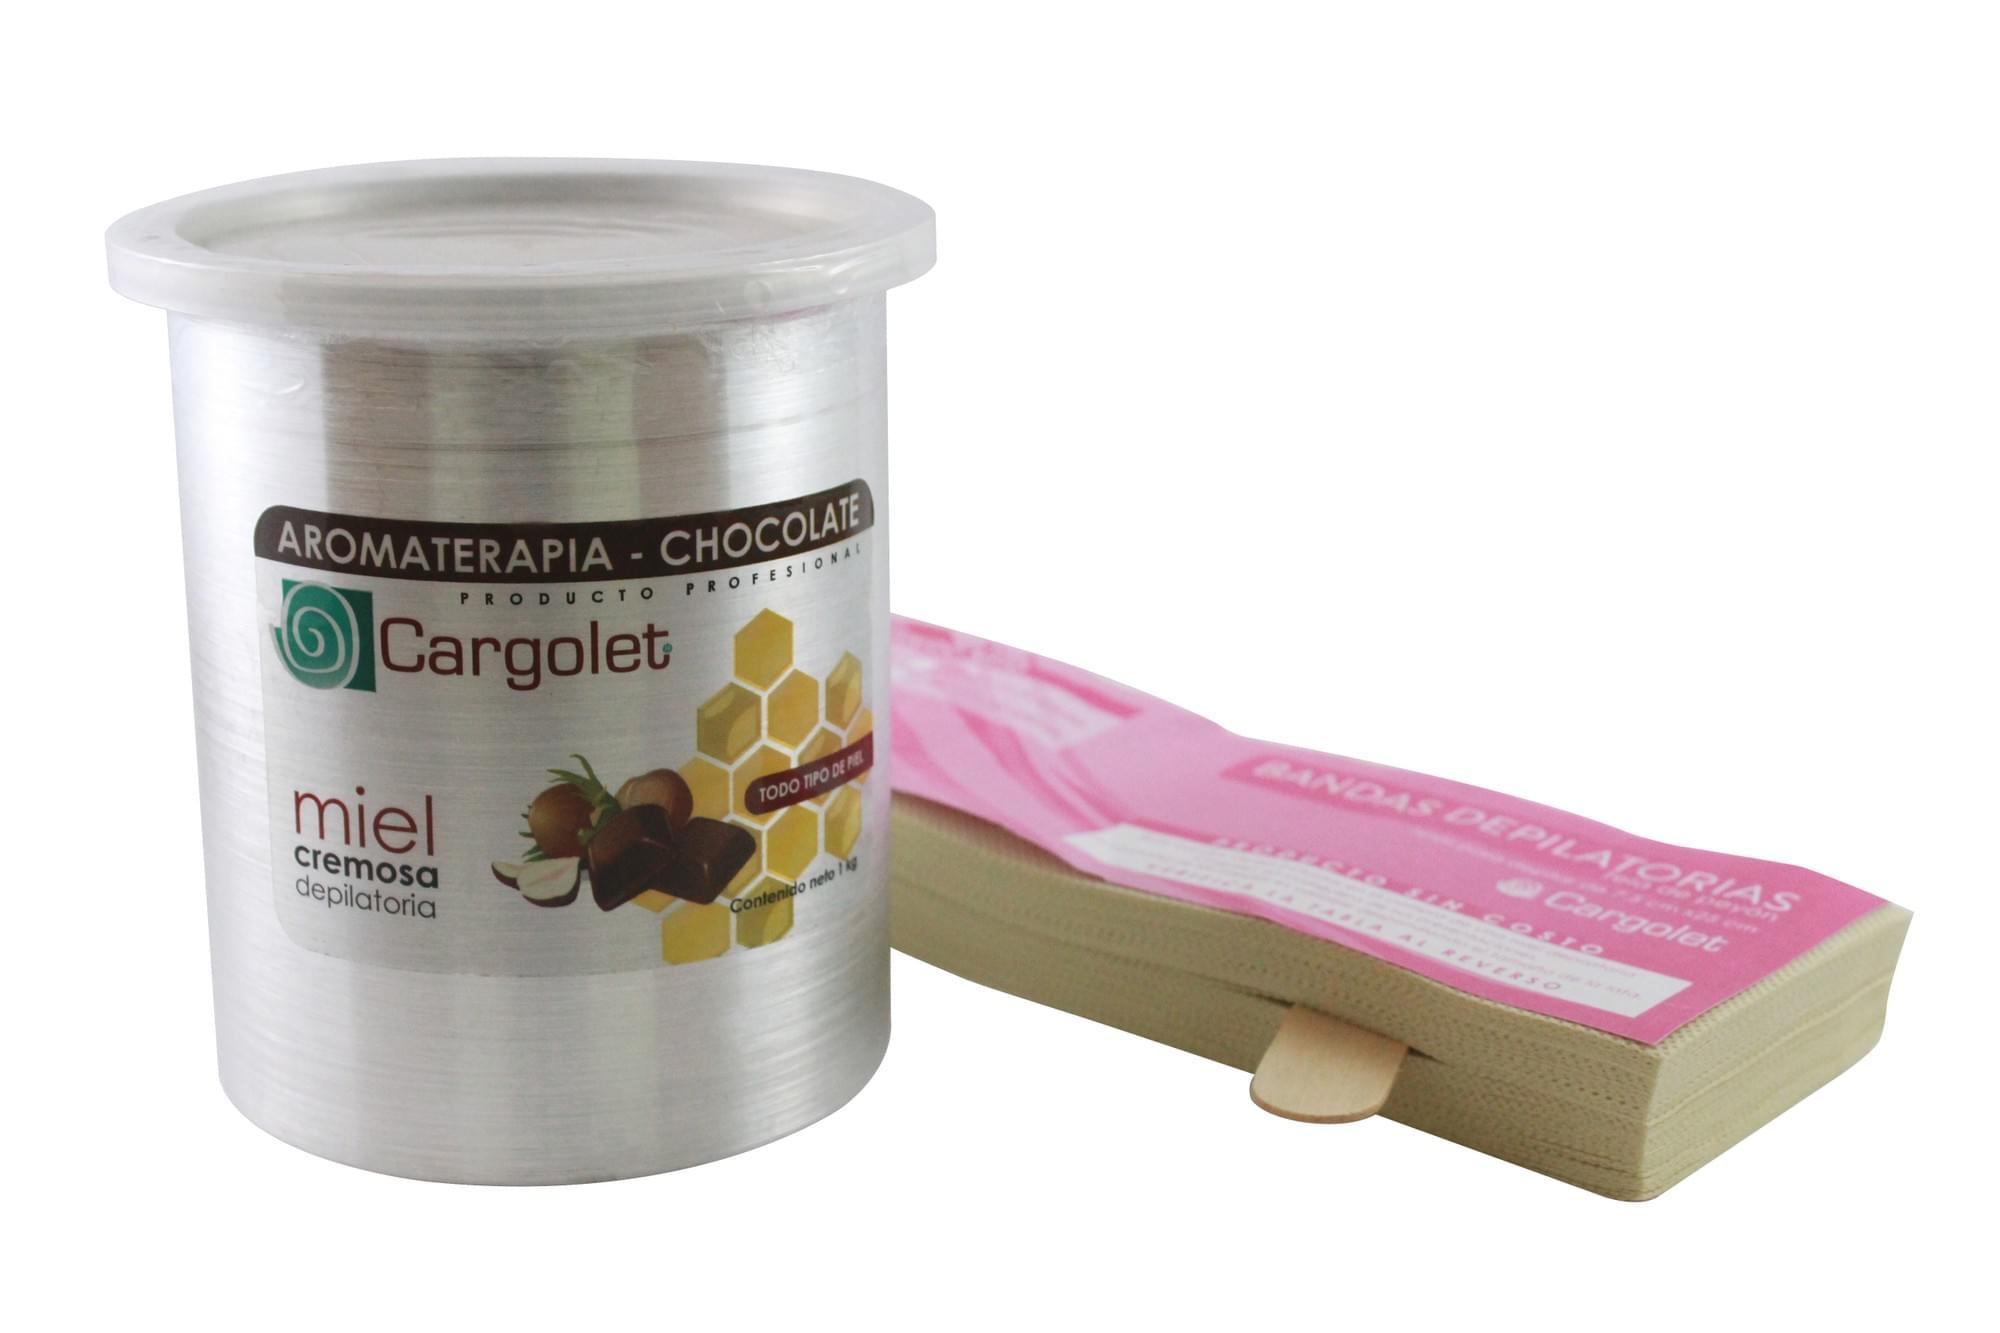 Miel depilatoria cremosa aromaterapia chocolate 1kg